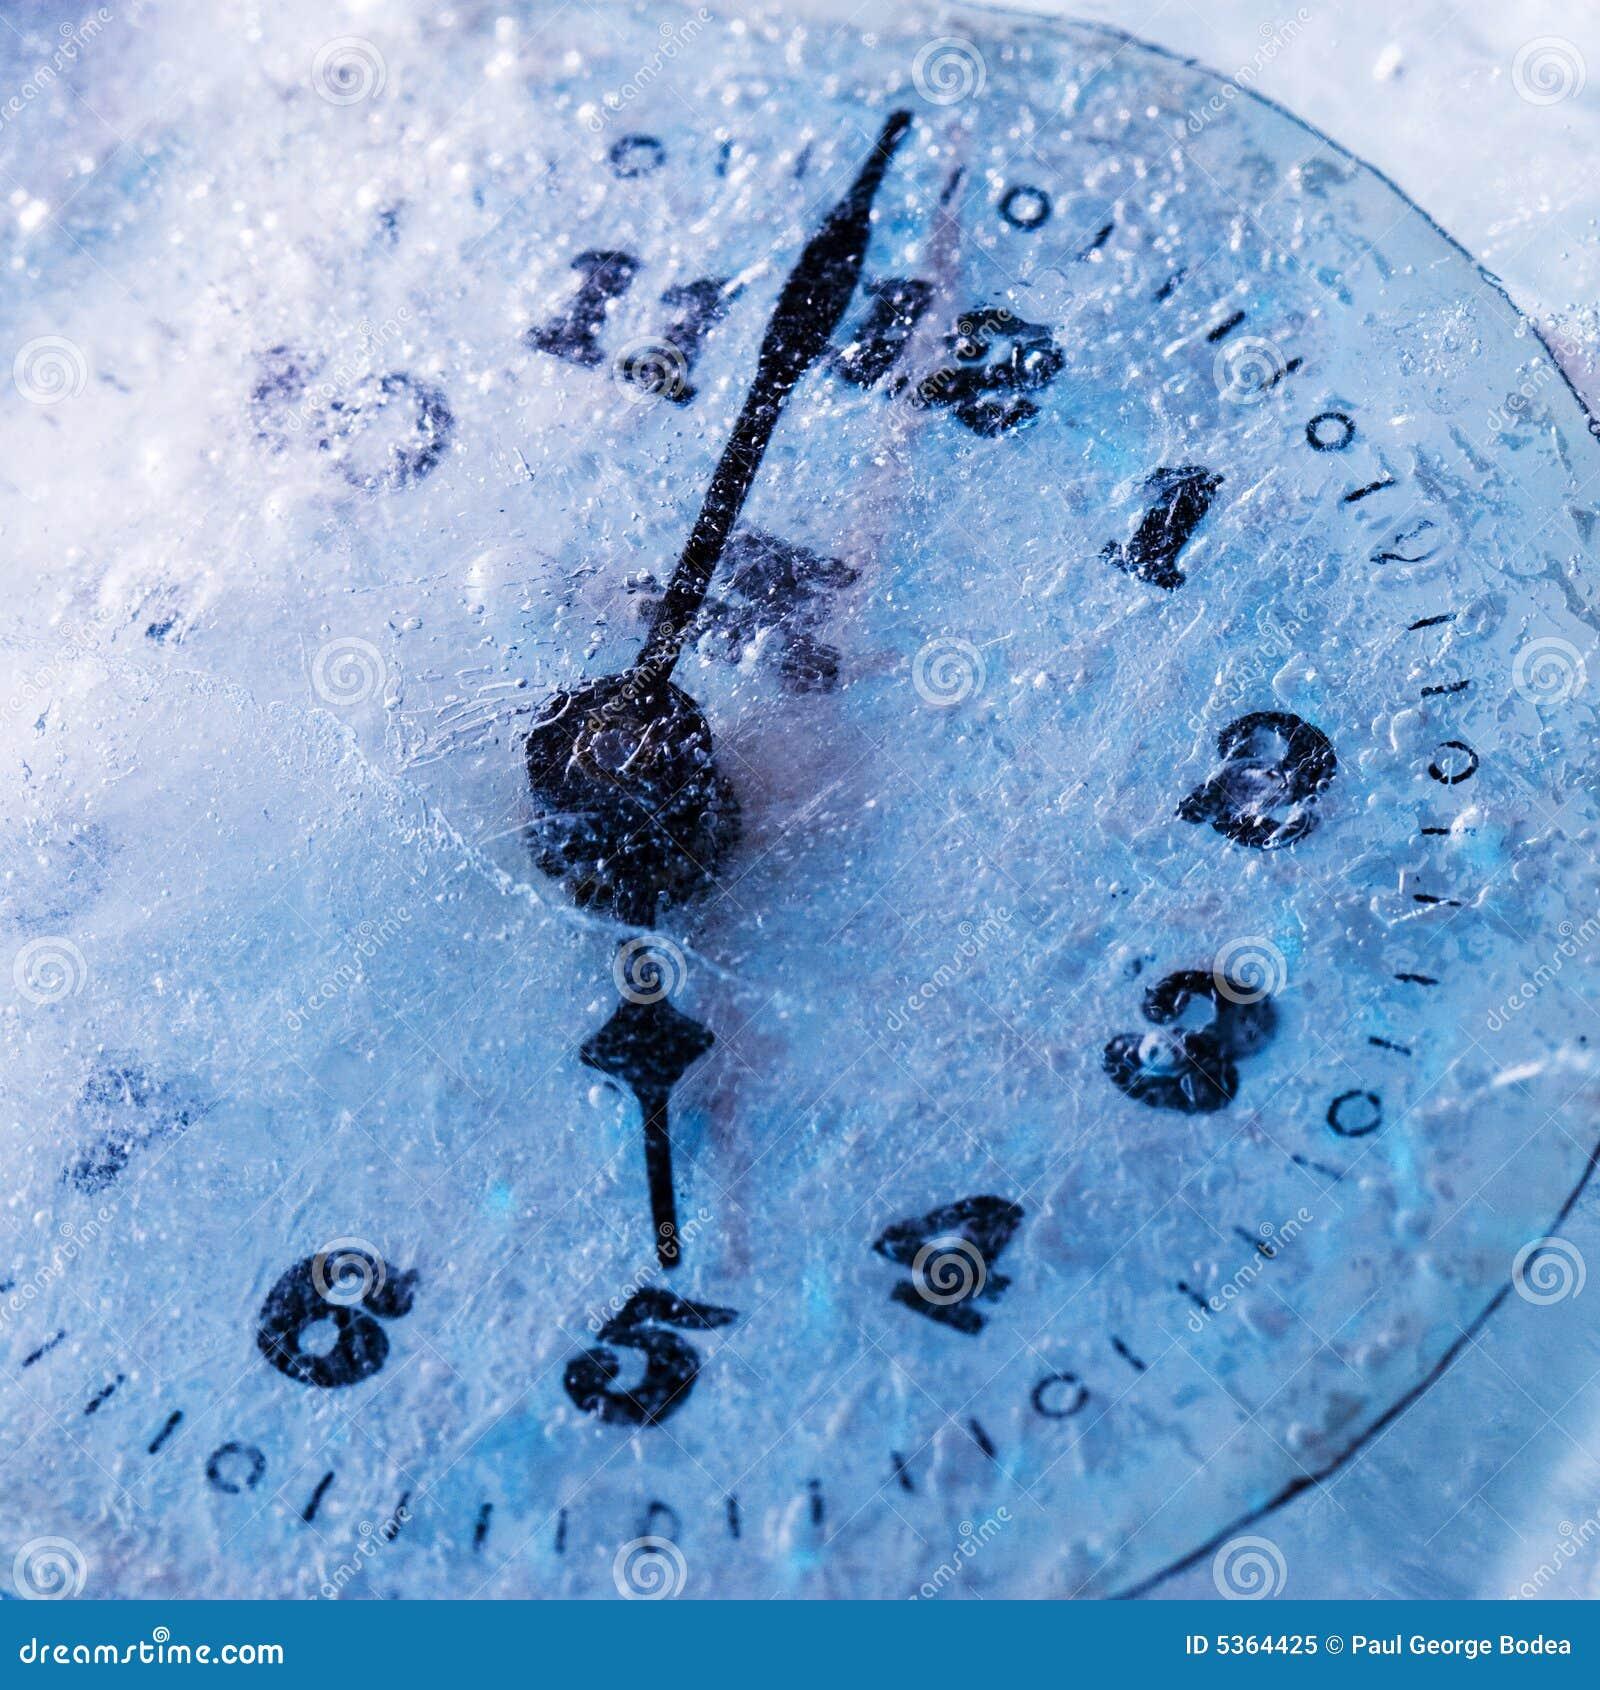 Time freeze